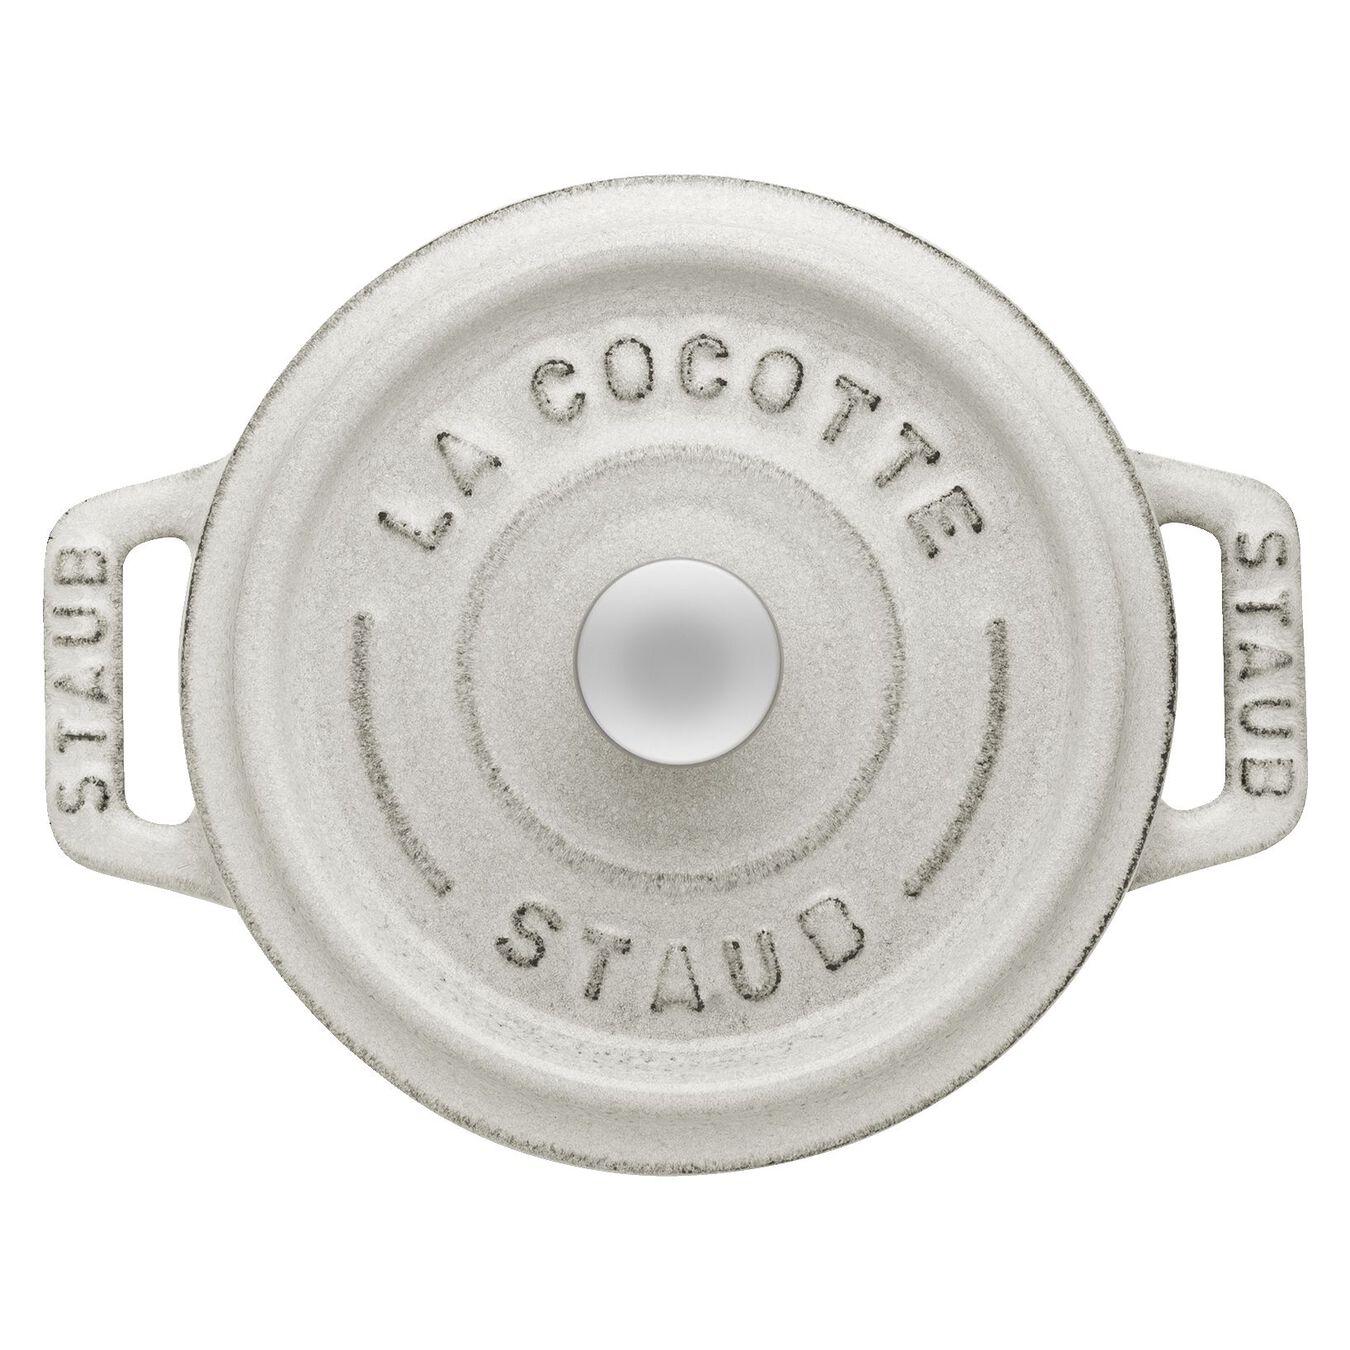 Mini Cocotte 10 cm, Rond(e), White Truffle, Fonte,,large 3